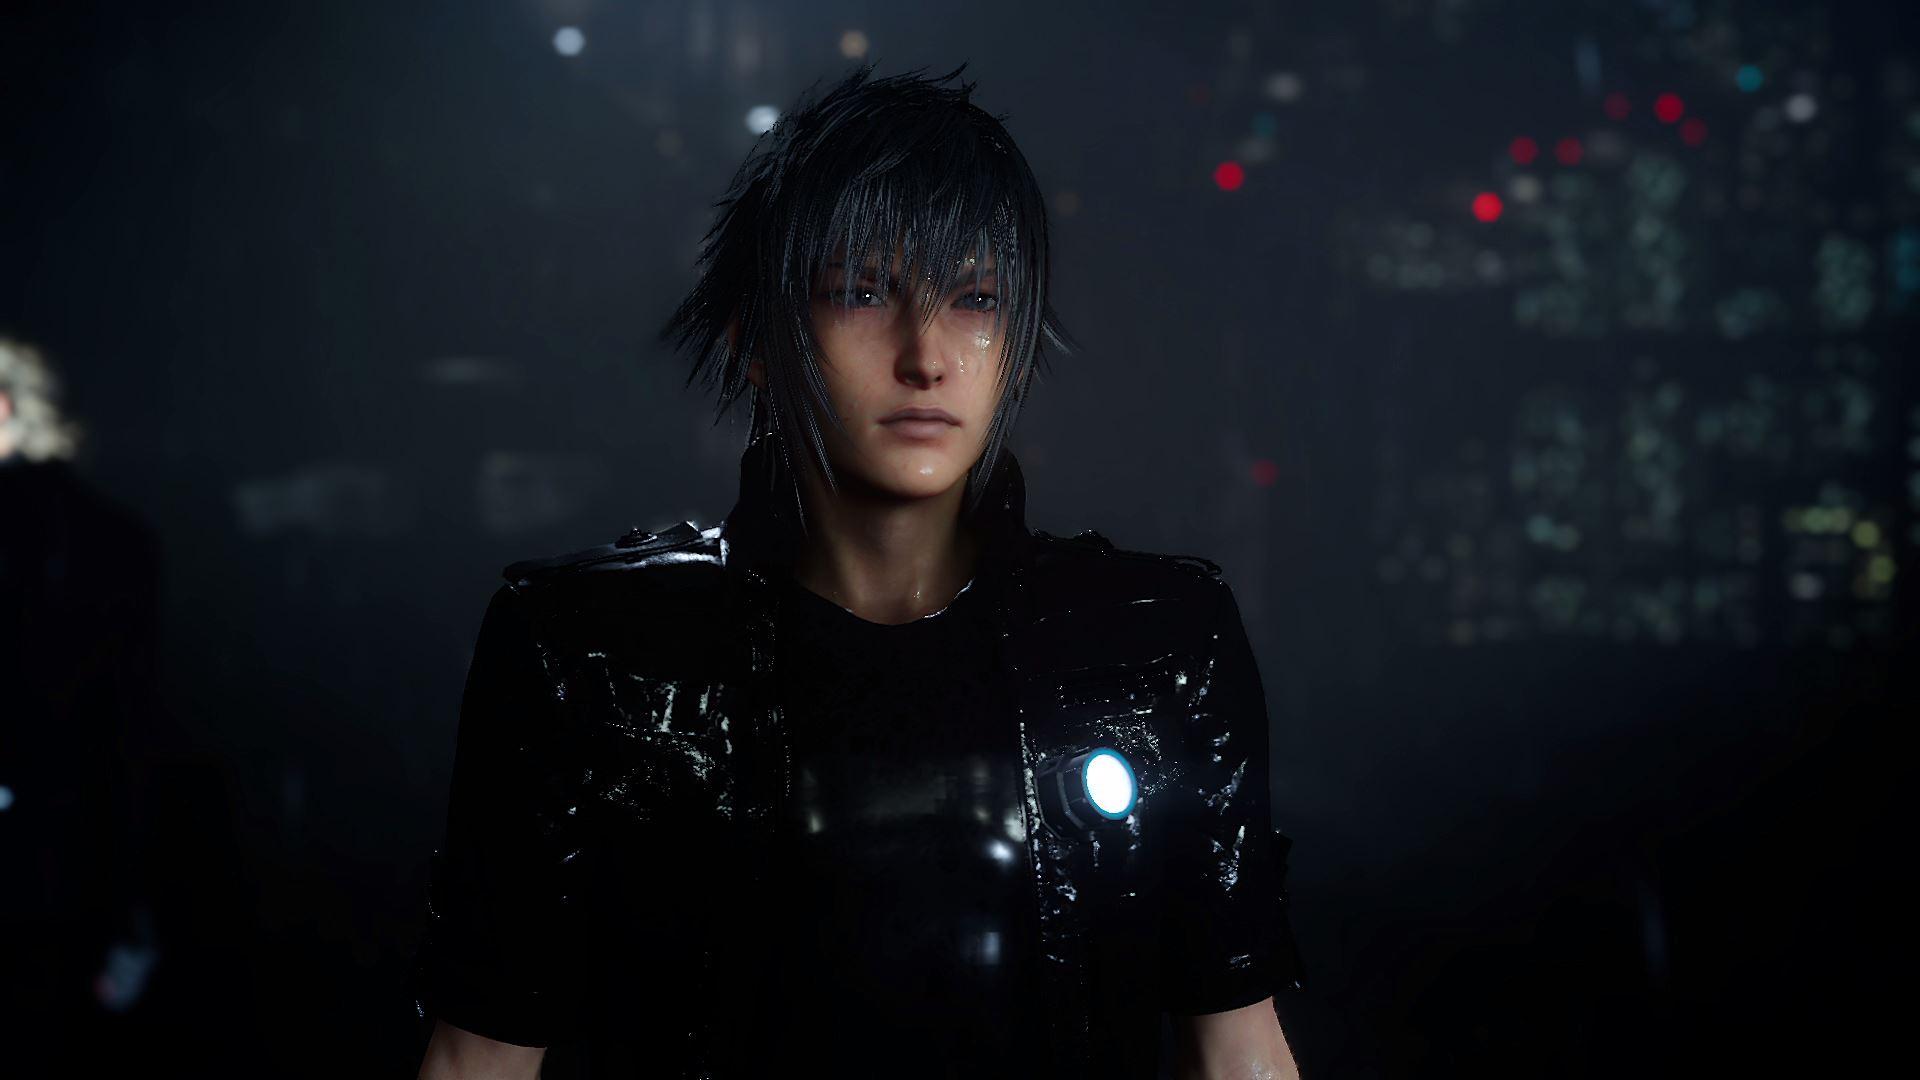 Final Fantasy XV: Windows Edition image 1